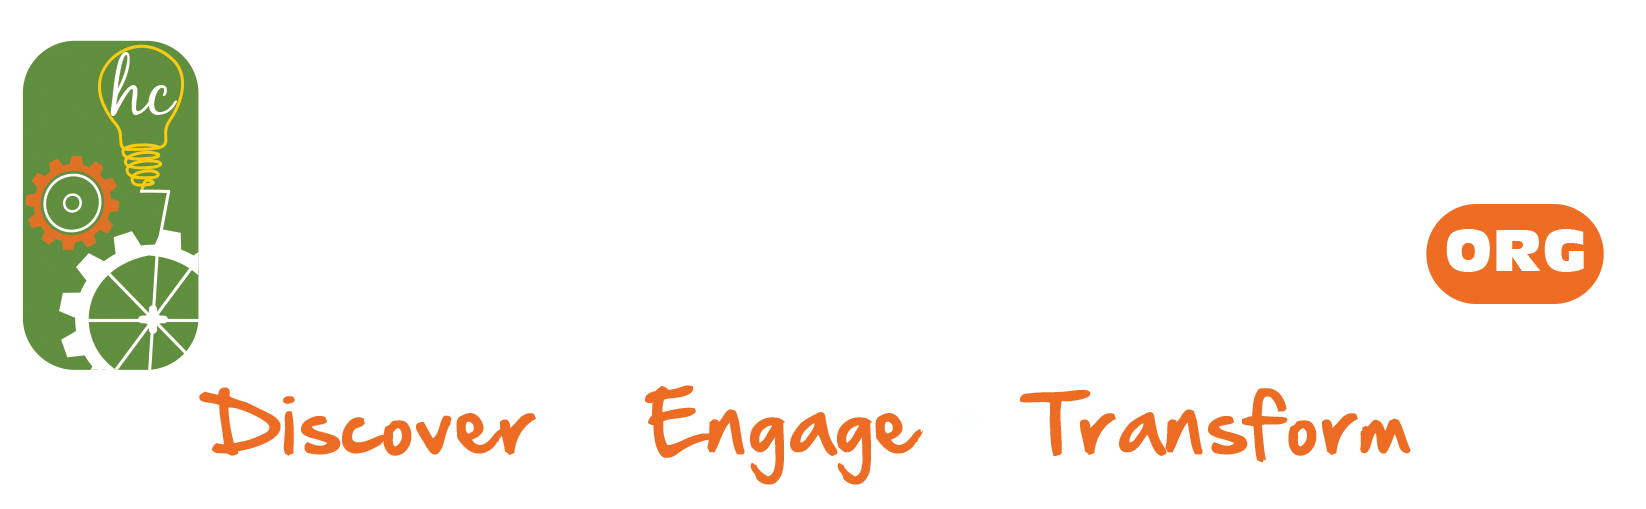 Tampa-Hillsborough County Public Library